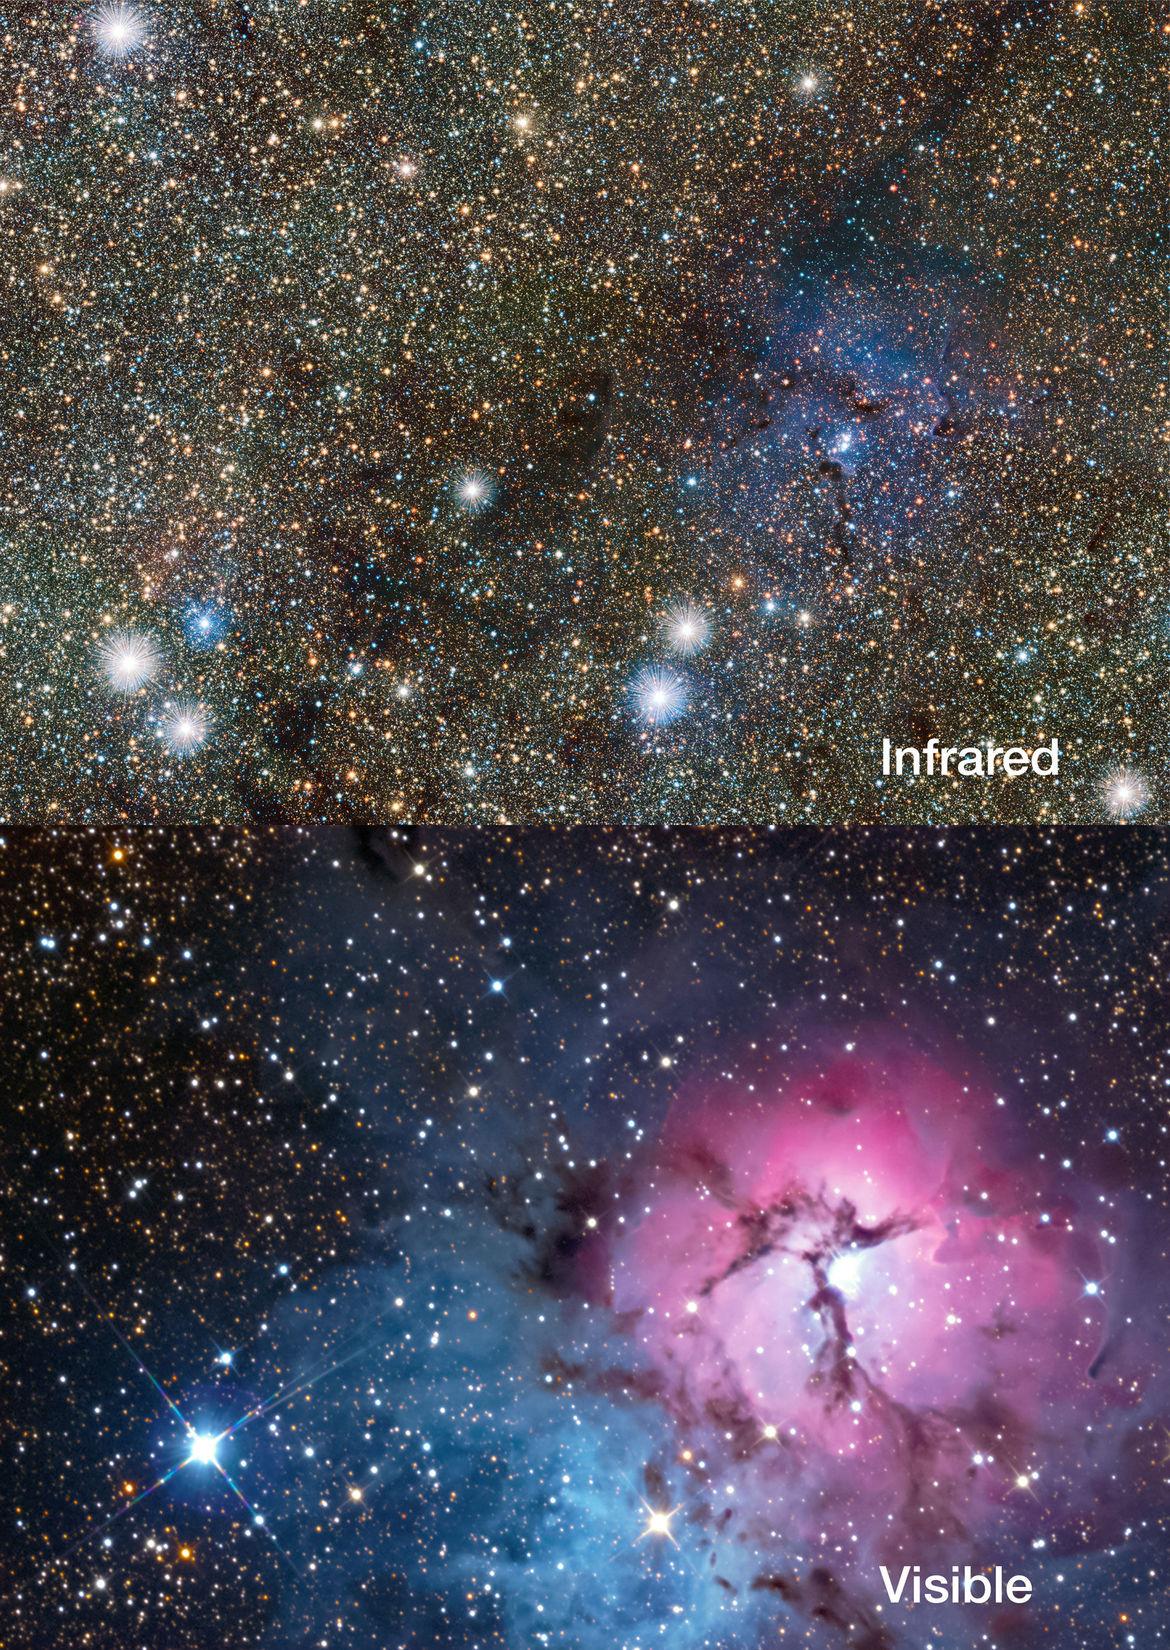 The Trifid Nebula in infrared light (top) versus optical light (bottom). Credit: ESO/VVV consortium/D. Minniti/Gábor Tóth